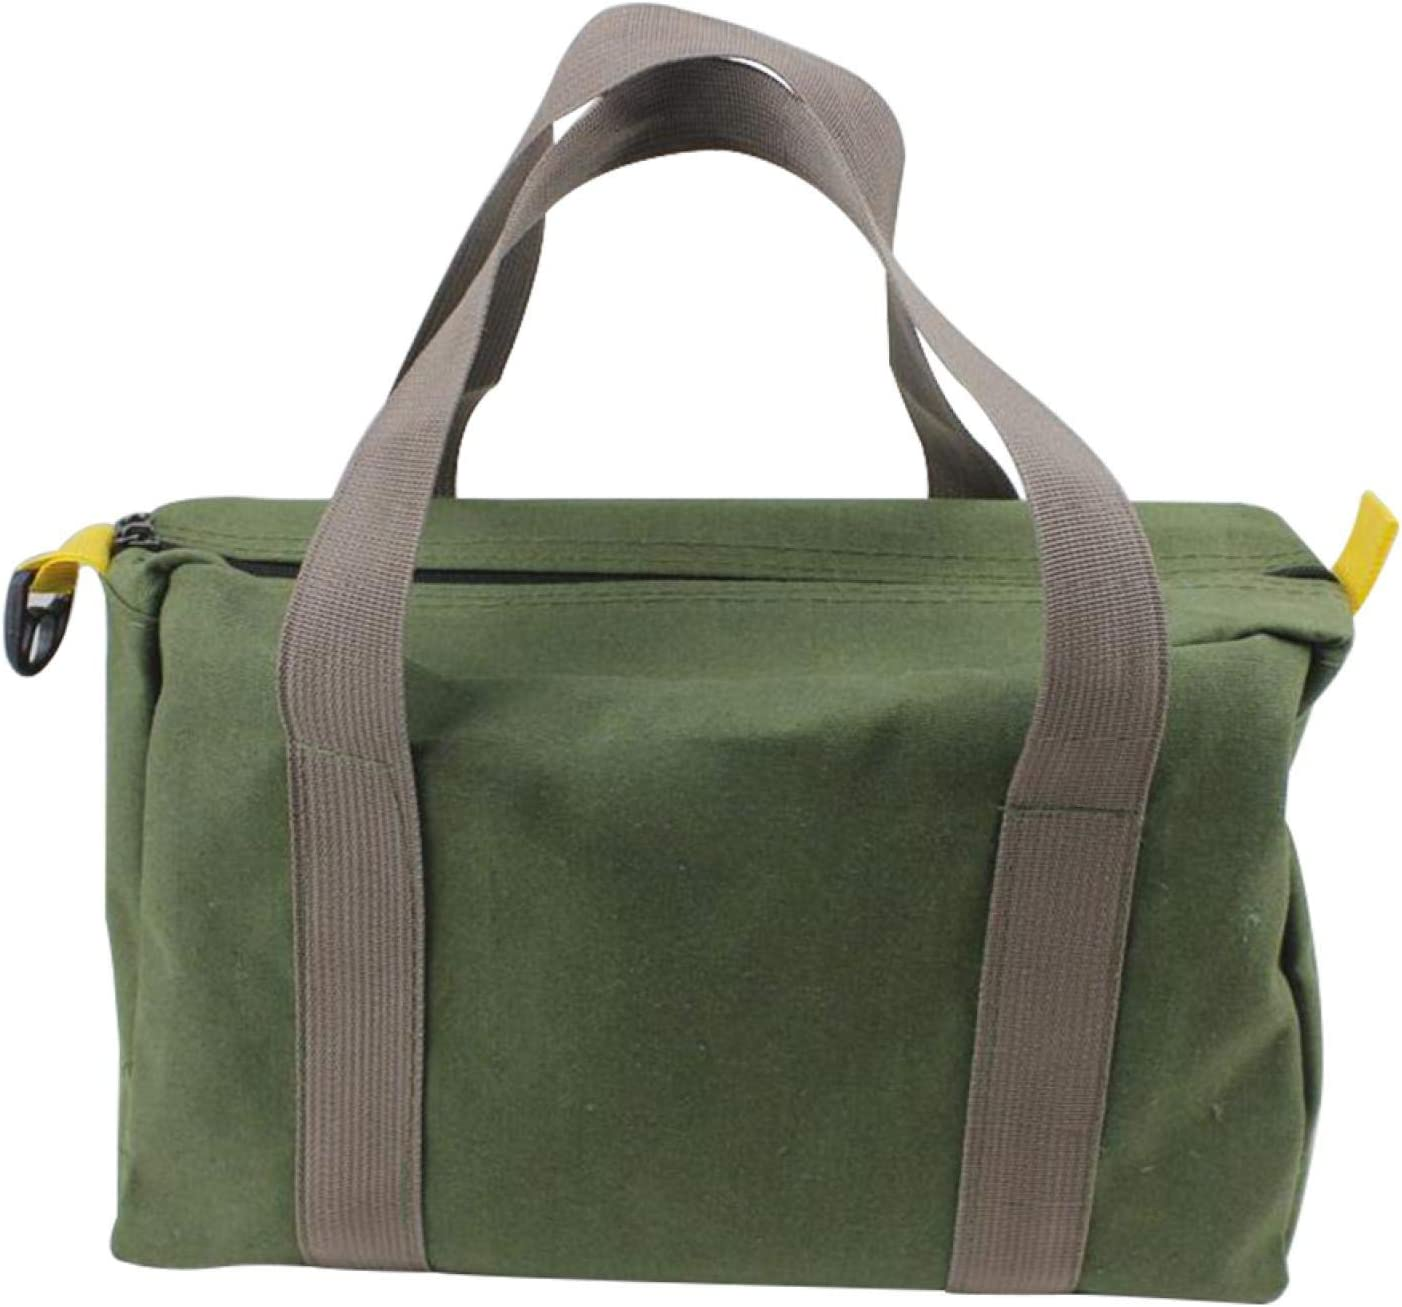 Heavy Duty Canvas Tool Bag, Multi-function High Capacity Tool St